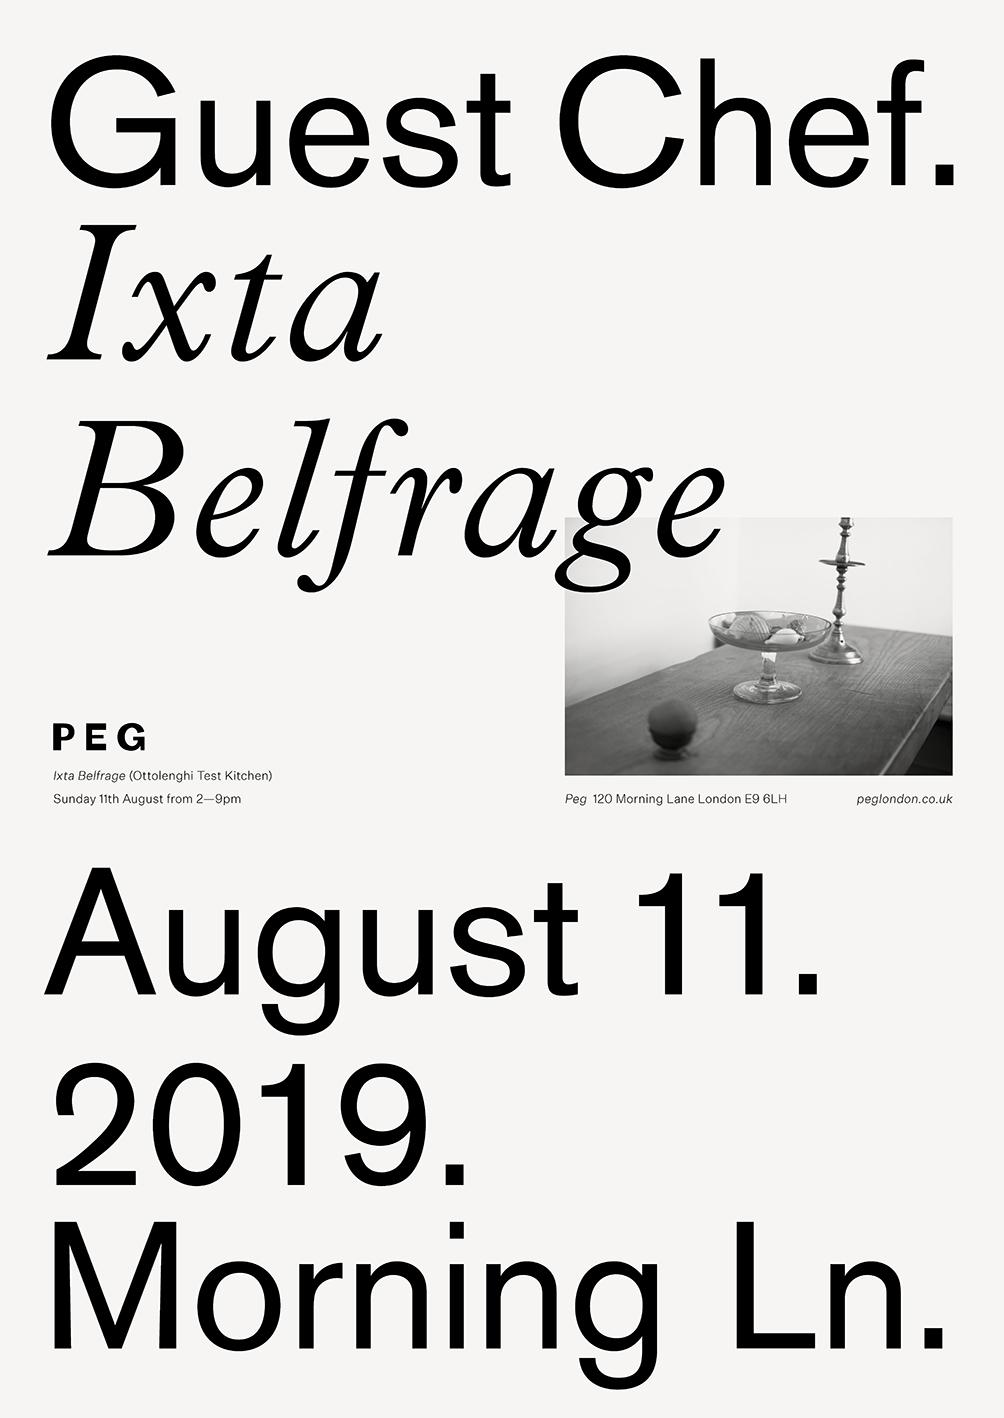 PEG_ixta-belfrage_A1_DIGITAL_WEB-READY.jpg